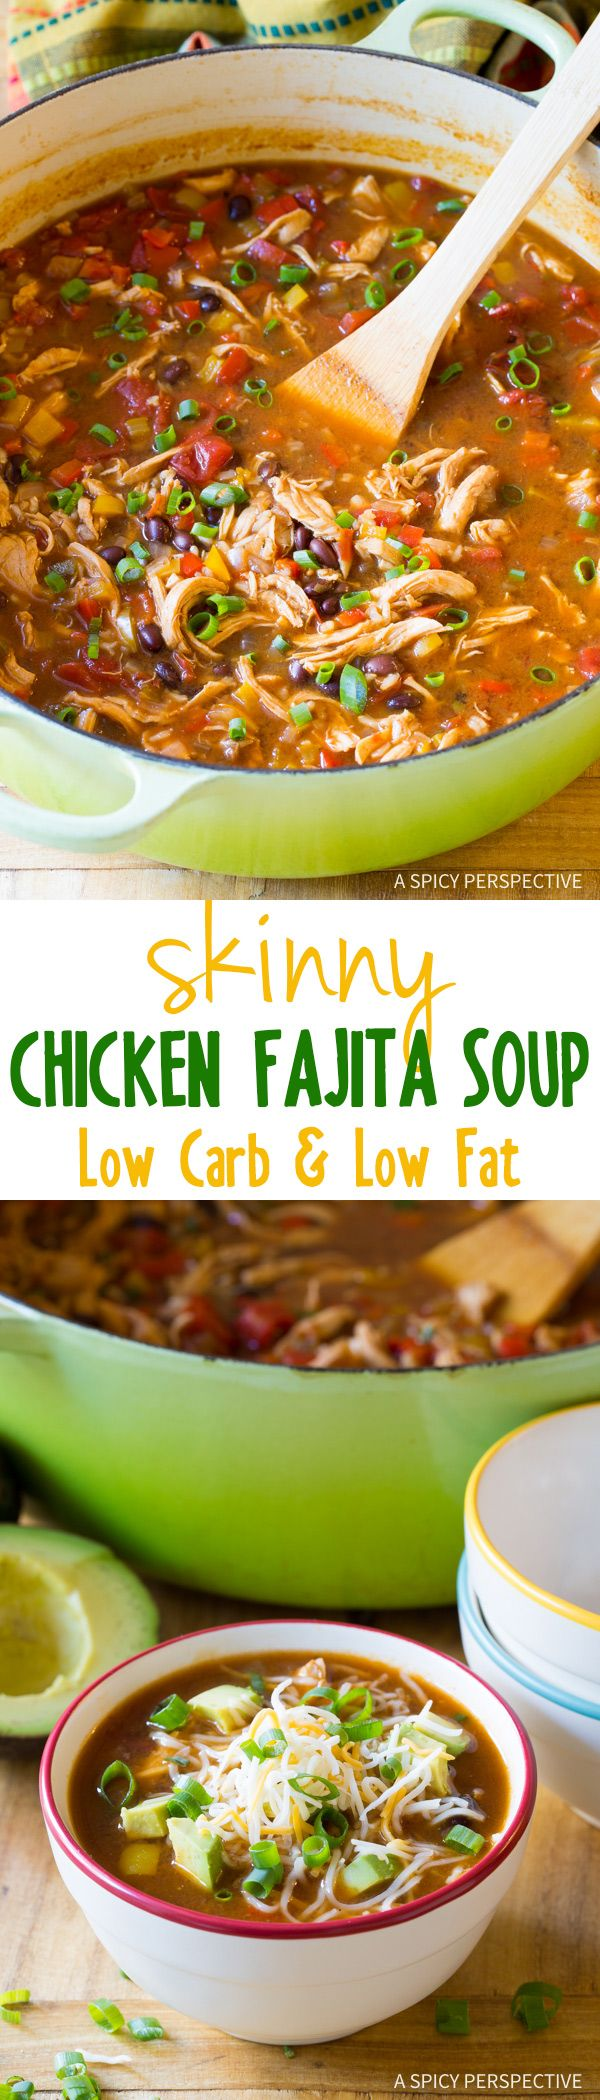 Skinny Chicken Fajita Soup #lowcarbmeals